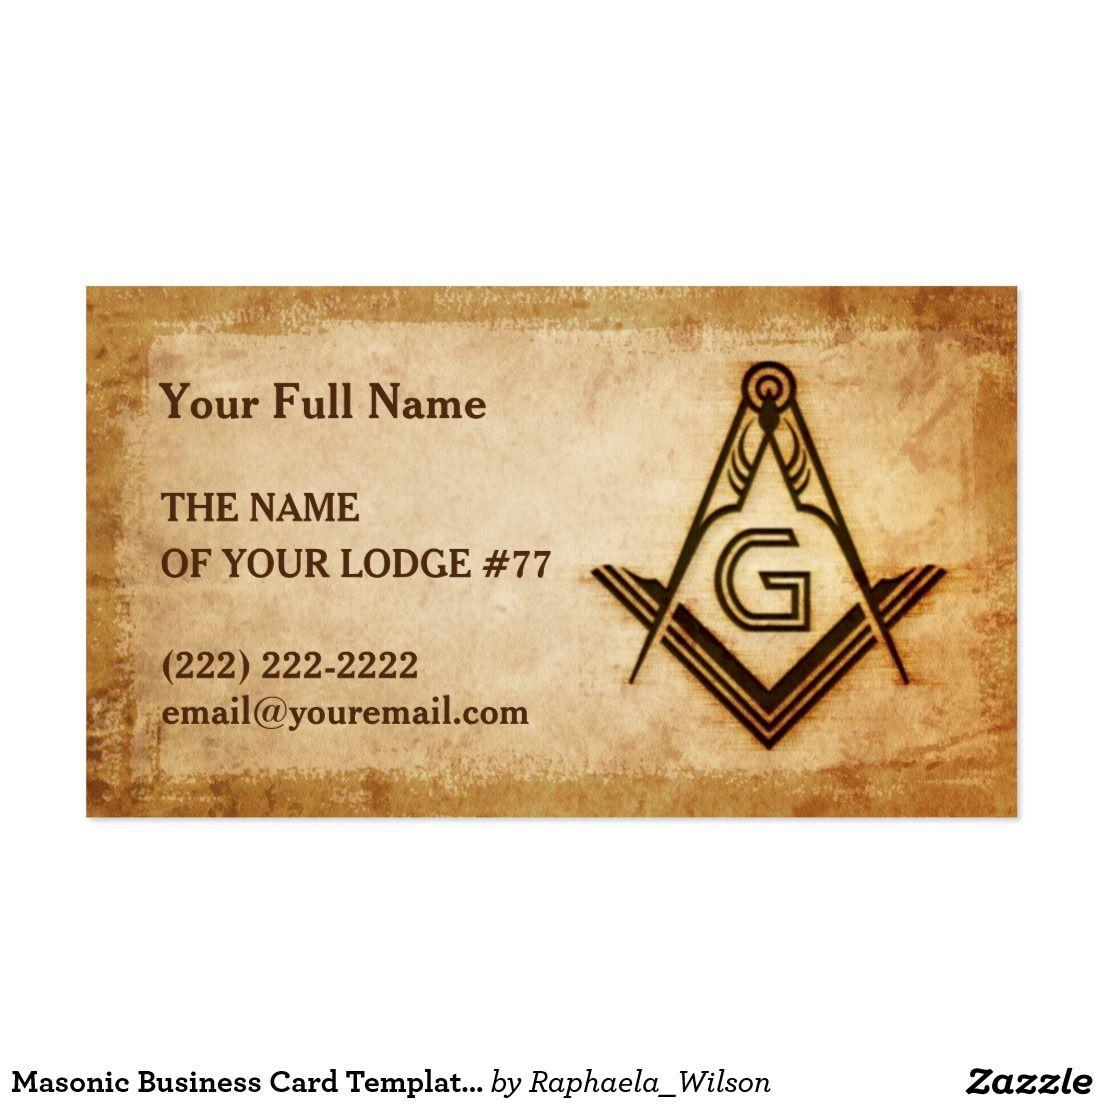 Masonic business card template rustic parchment custom masonic masonic business card template rustic parchment colourmoves